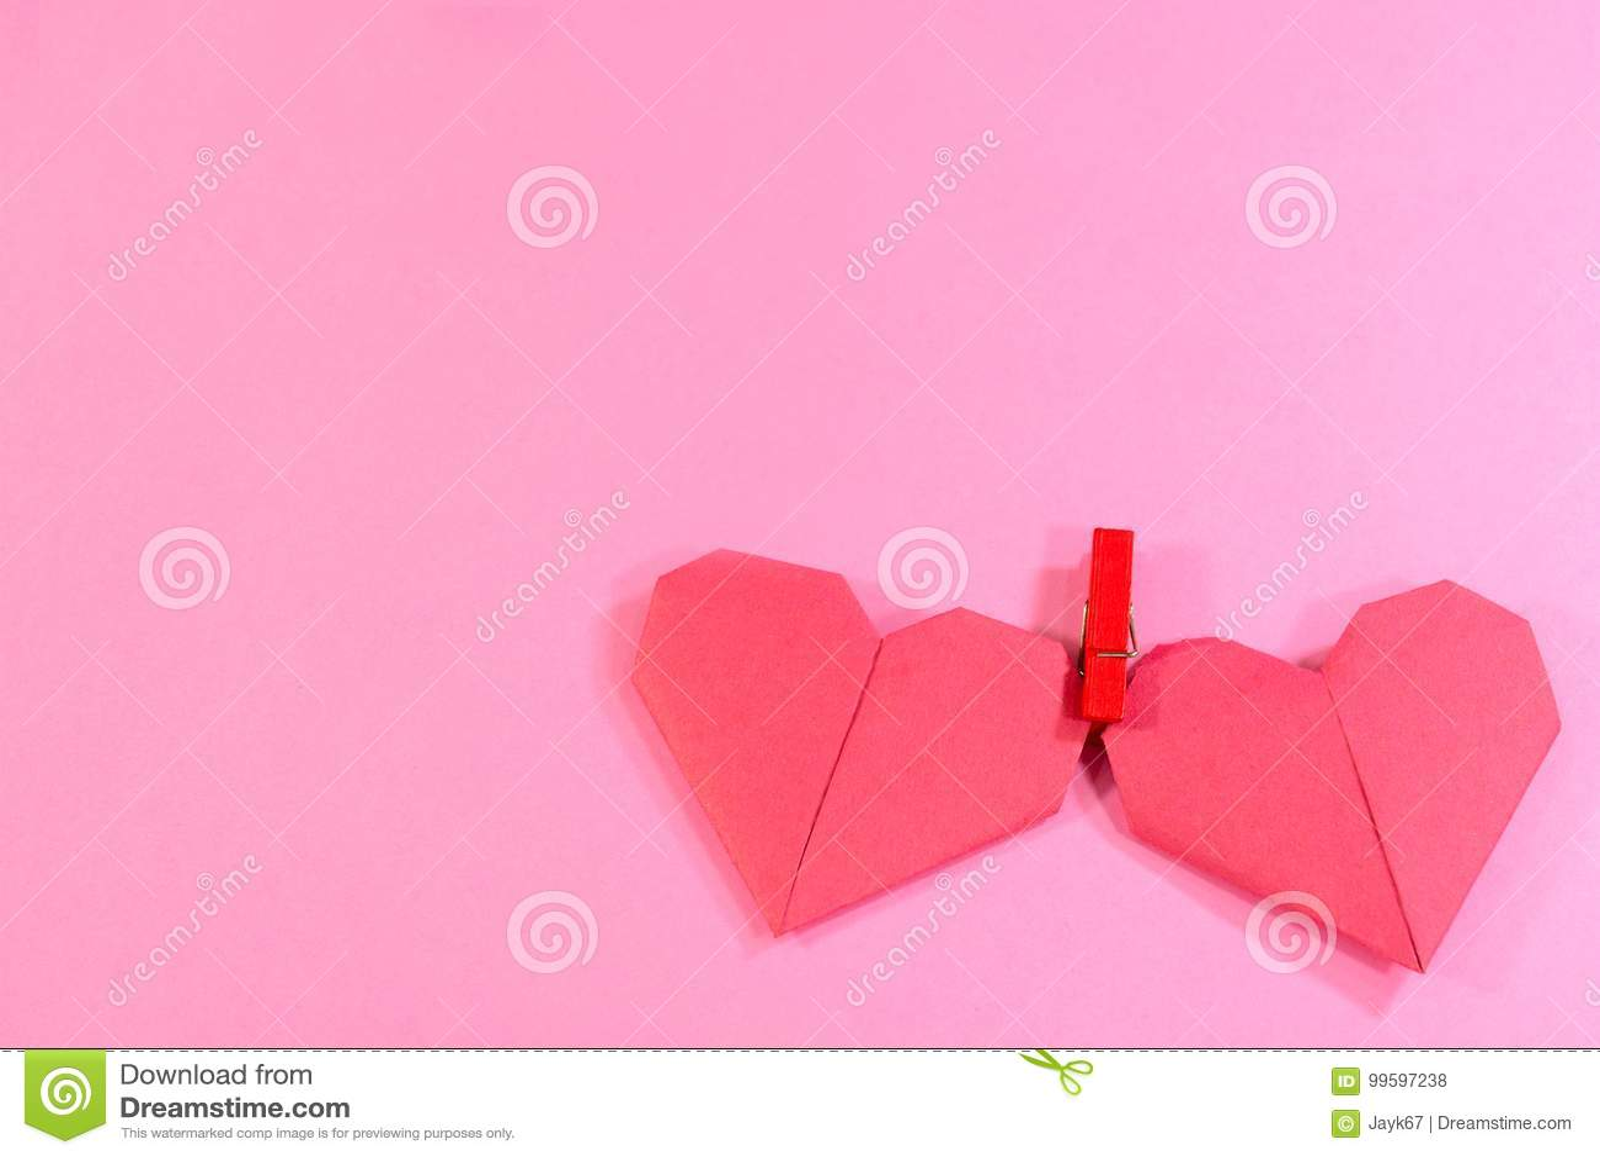 How to origami heart tie | heart tie craft tutorial – life hack | 957x1300